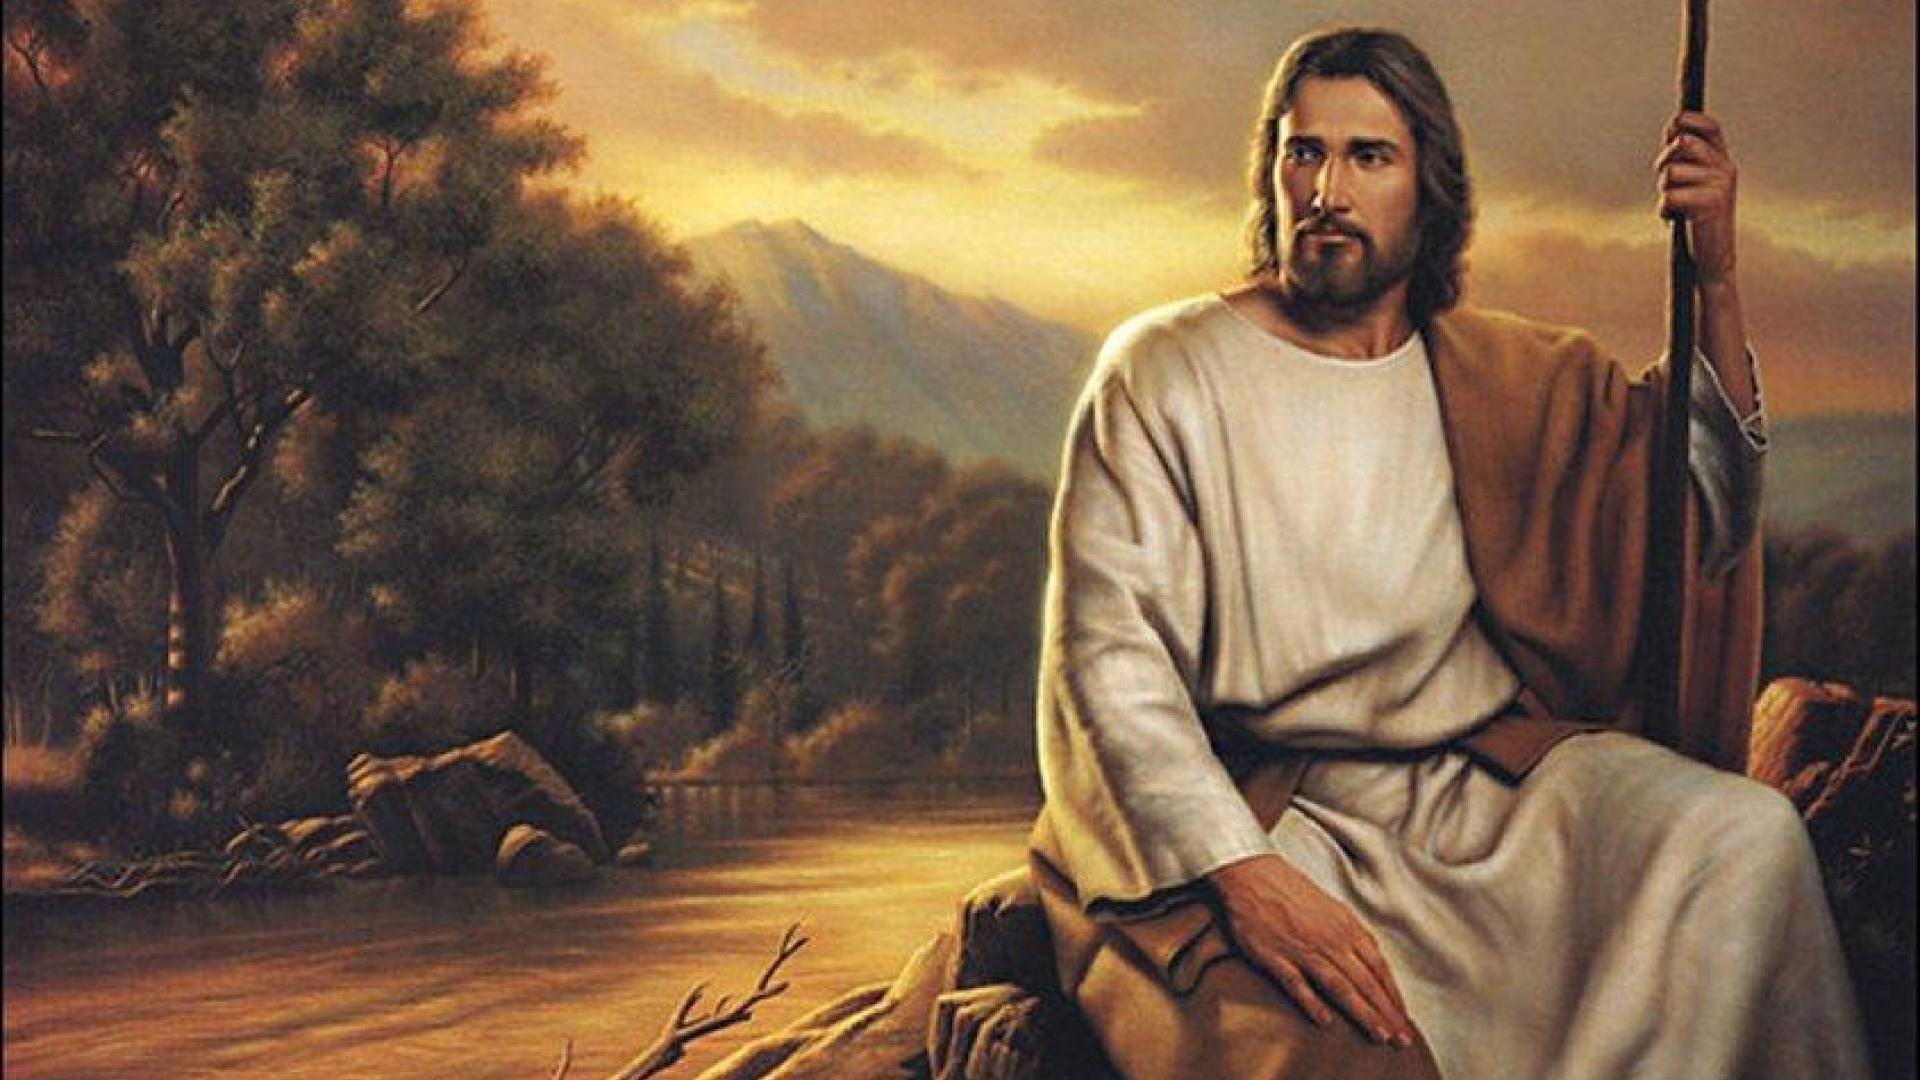 Wallpapers Of Jesus Christ Wallpapertag